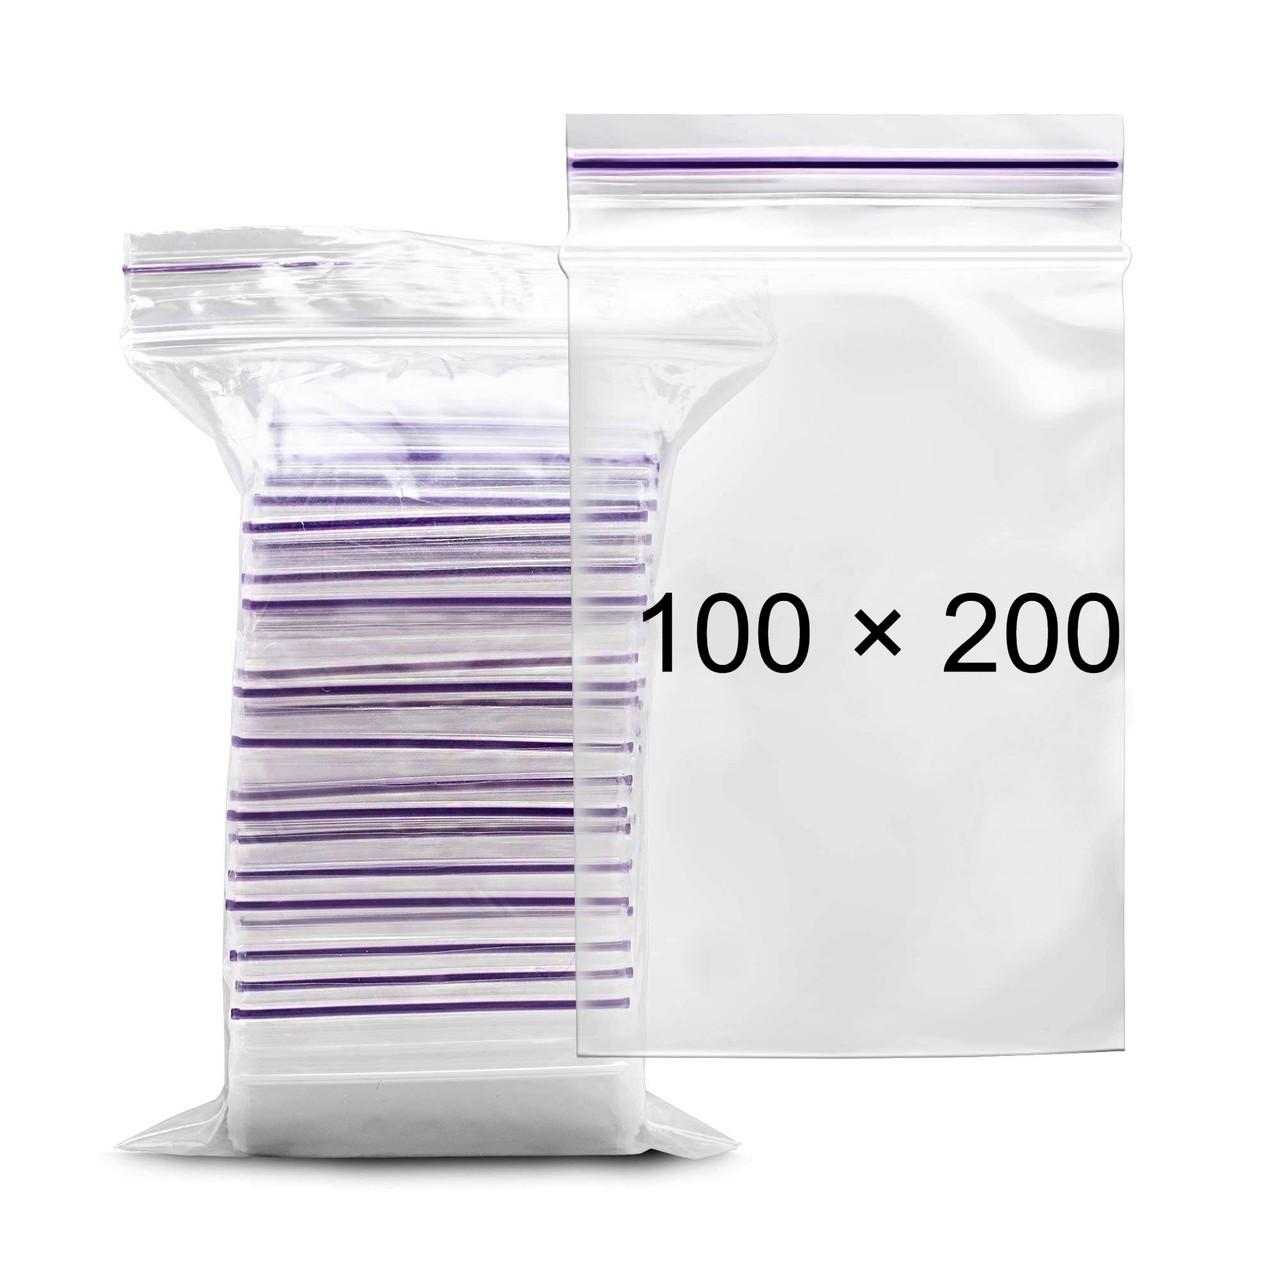 Пакеты с замком Zip-Lock - 100 × 200